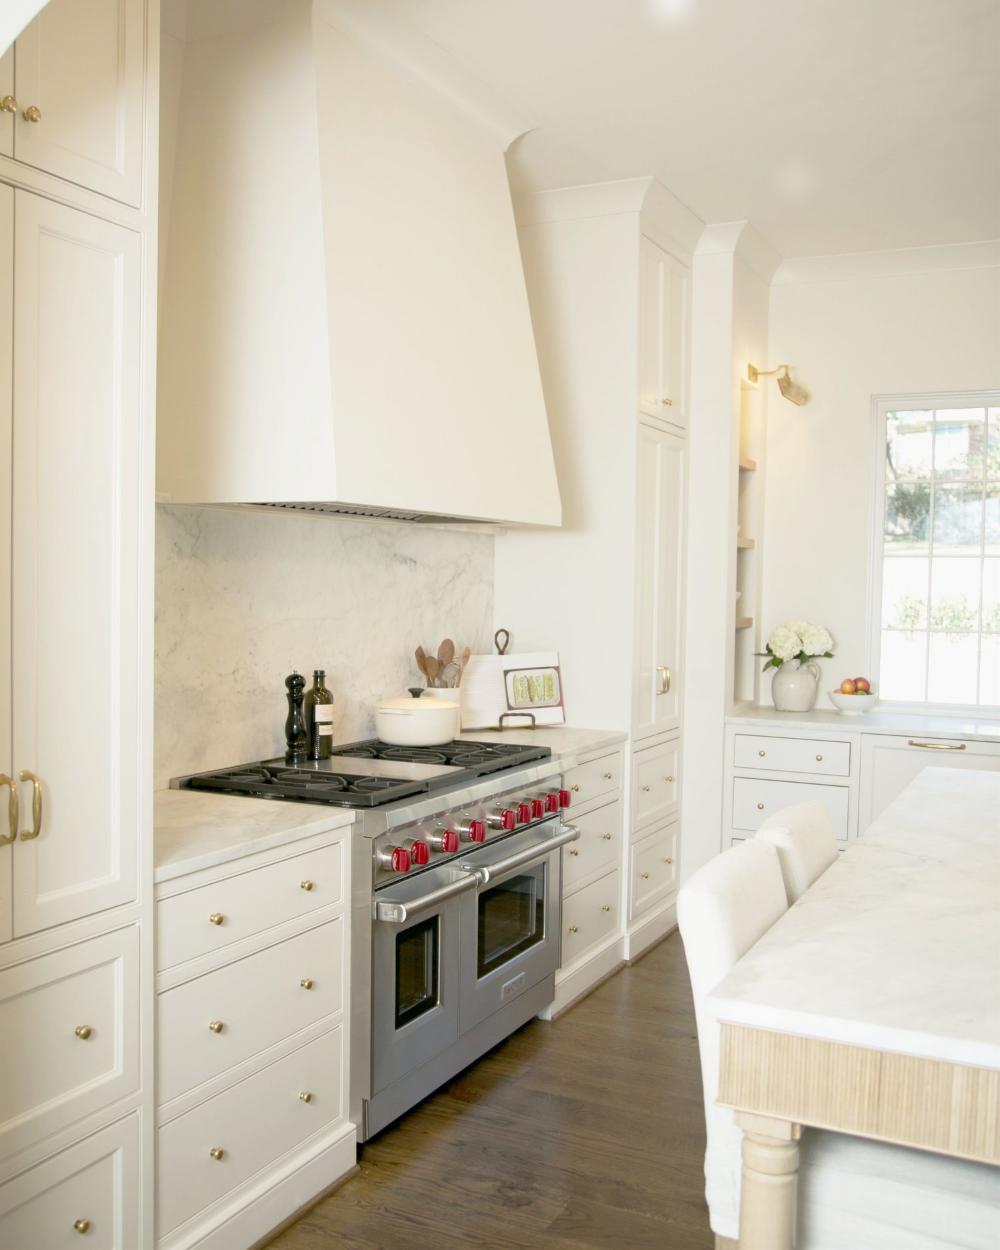 Tasha B Davis Interiors In 2020 Kitchen Design Interior Kitchen Cabinets